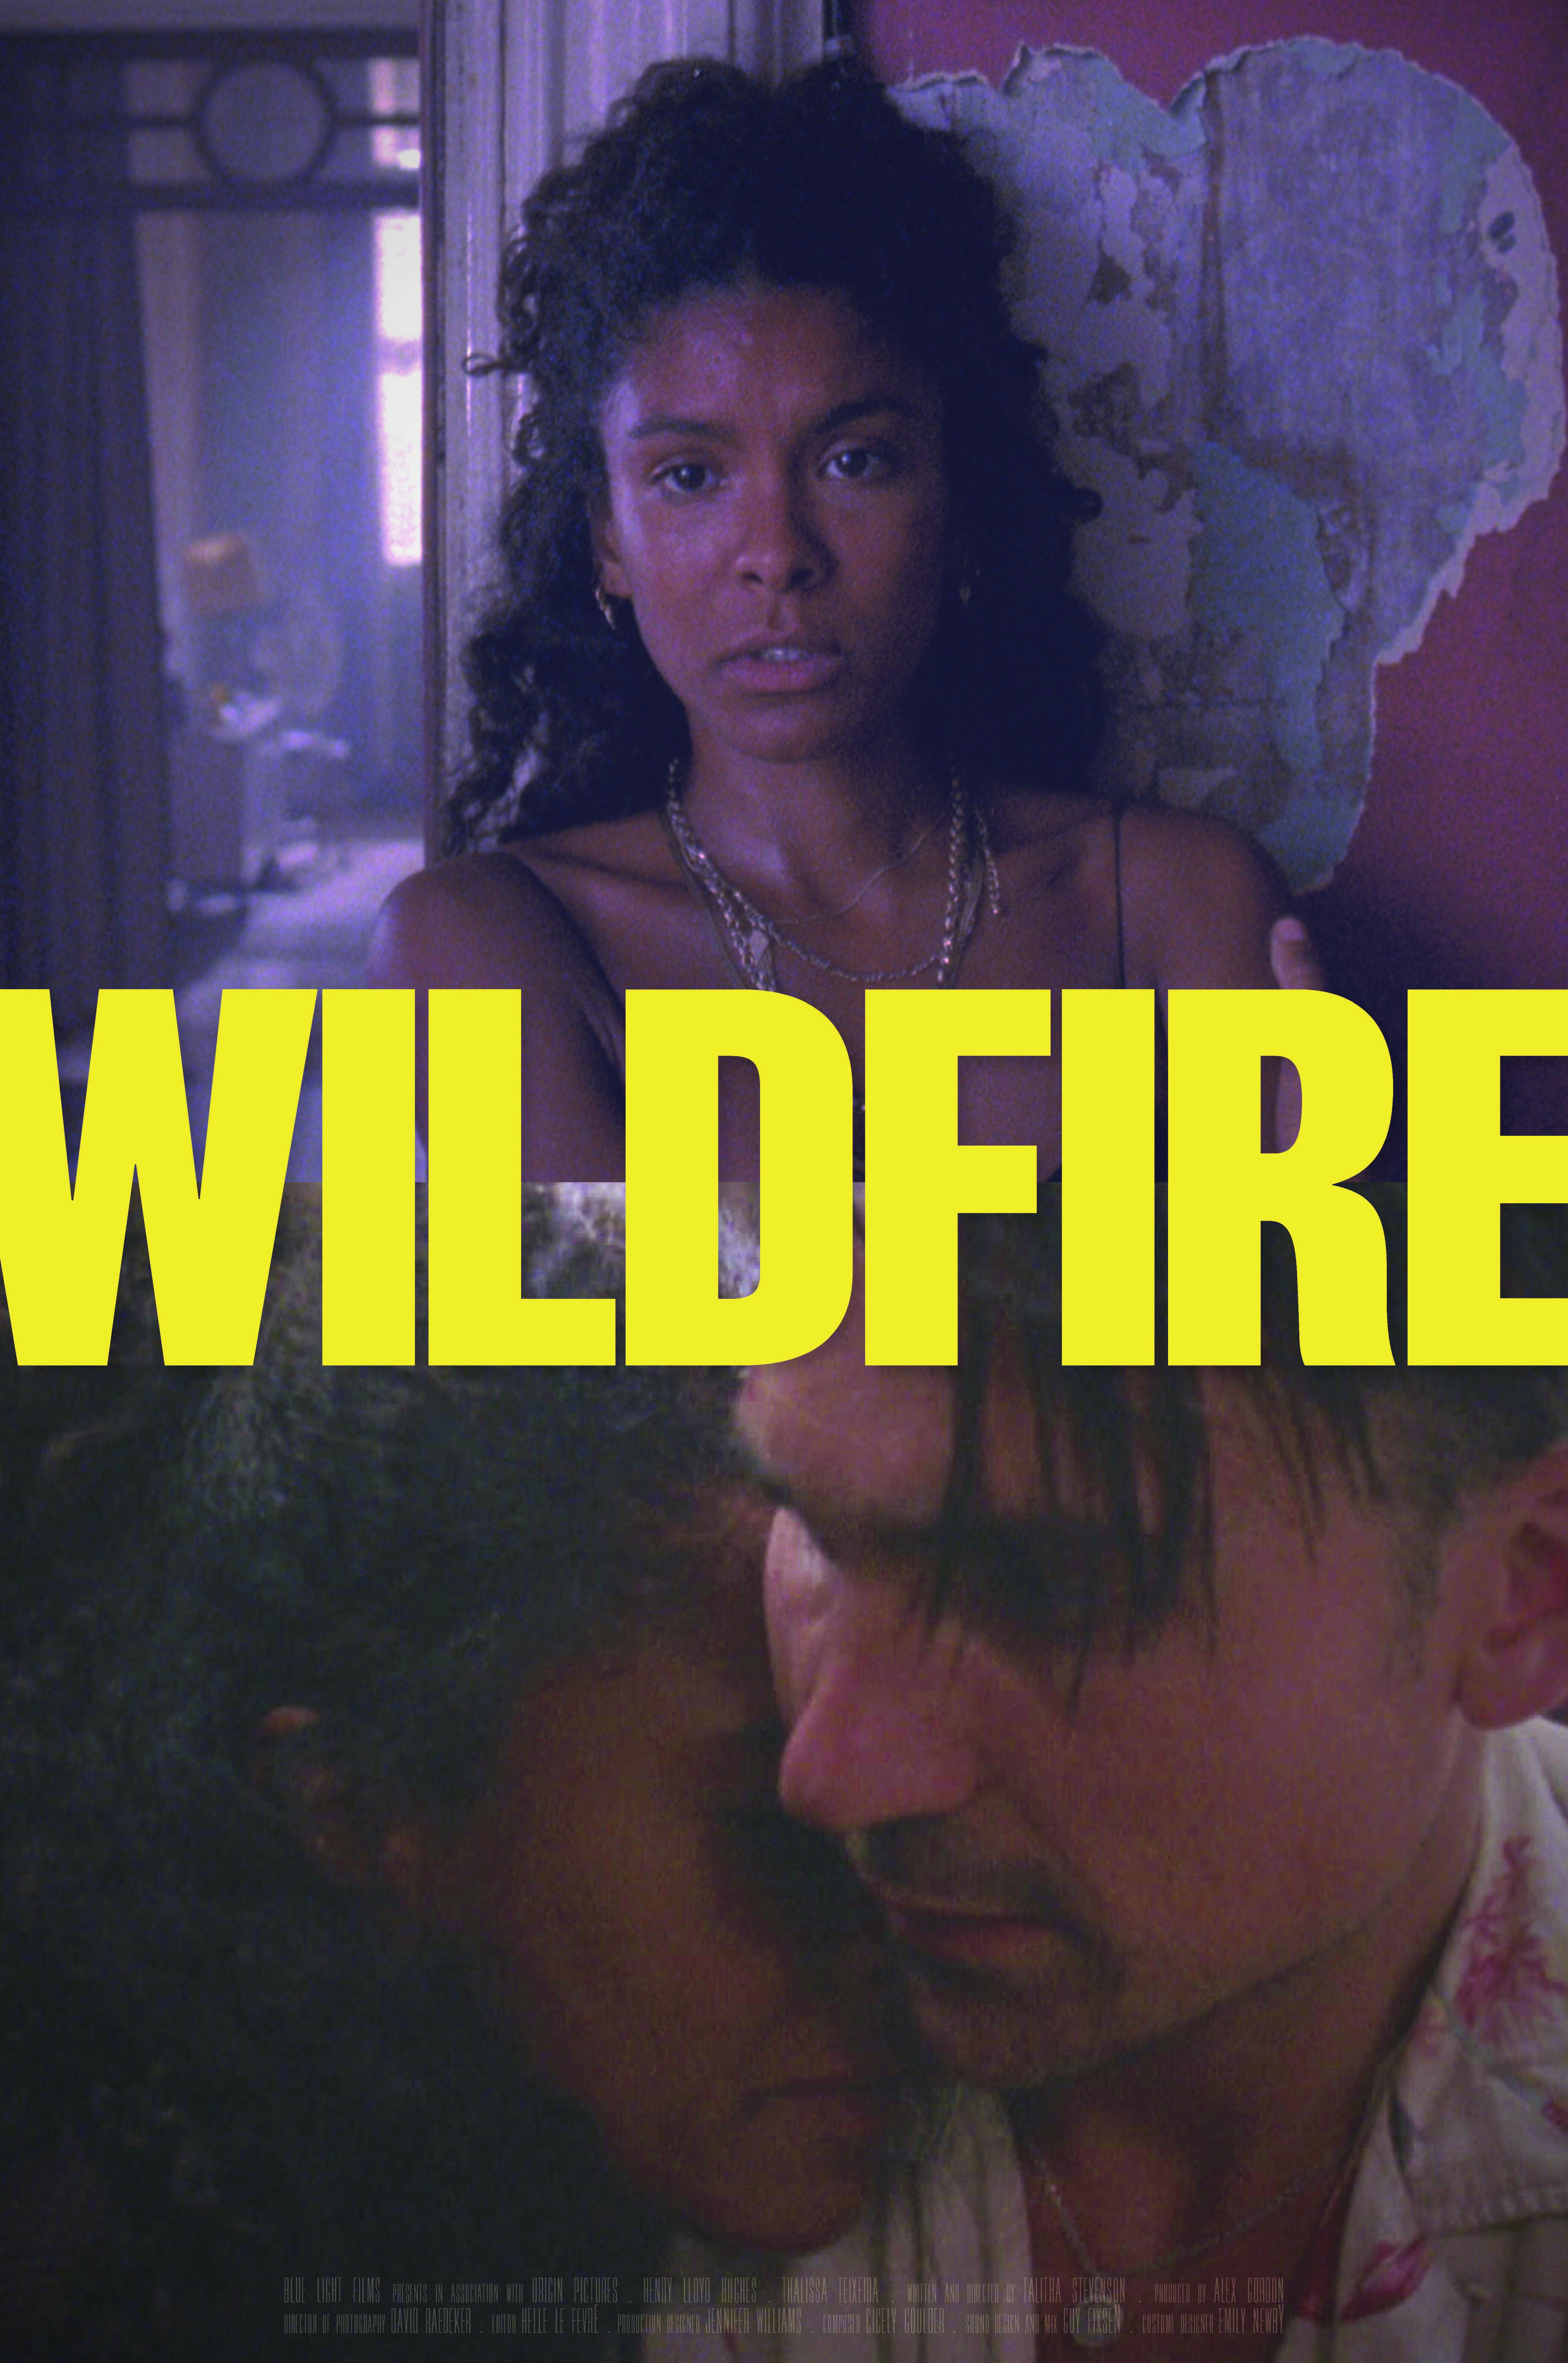 Wildfire (2019)